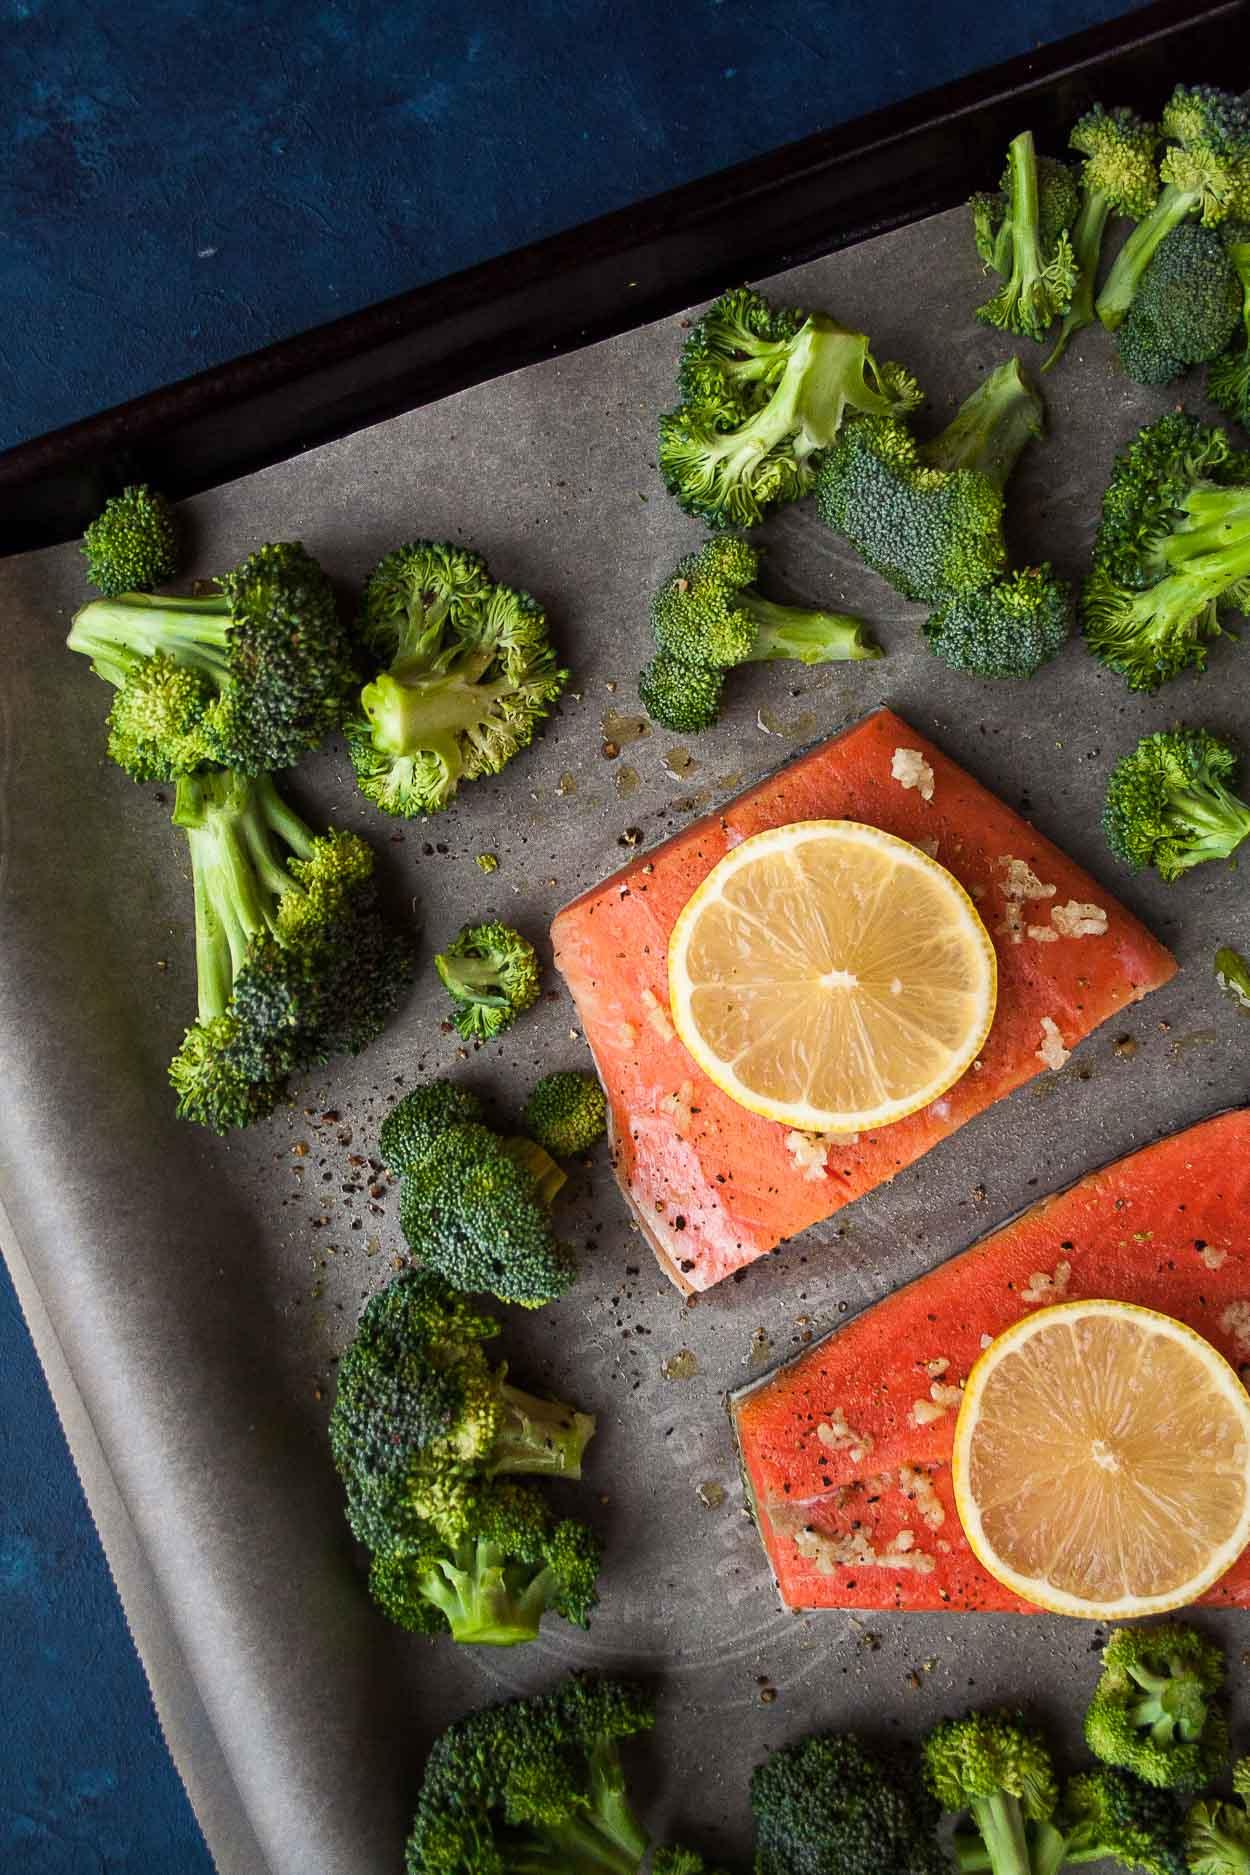 Sheet Pan Salmon Recipe with Roasted Broccoli